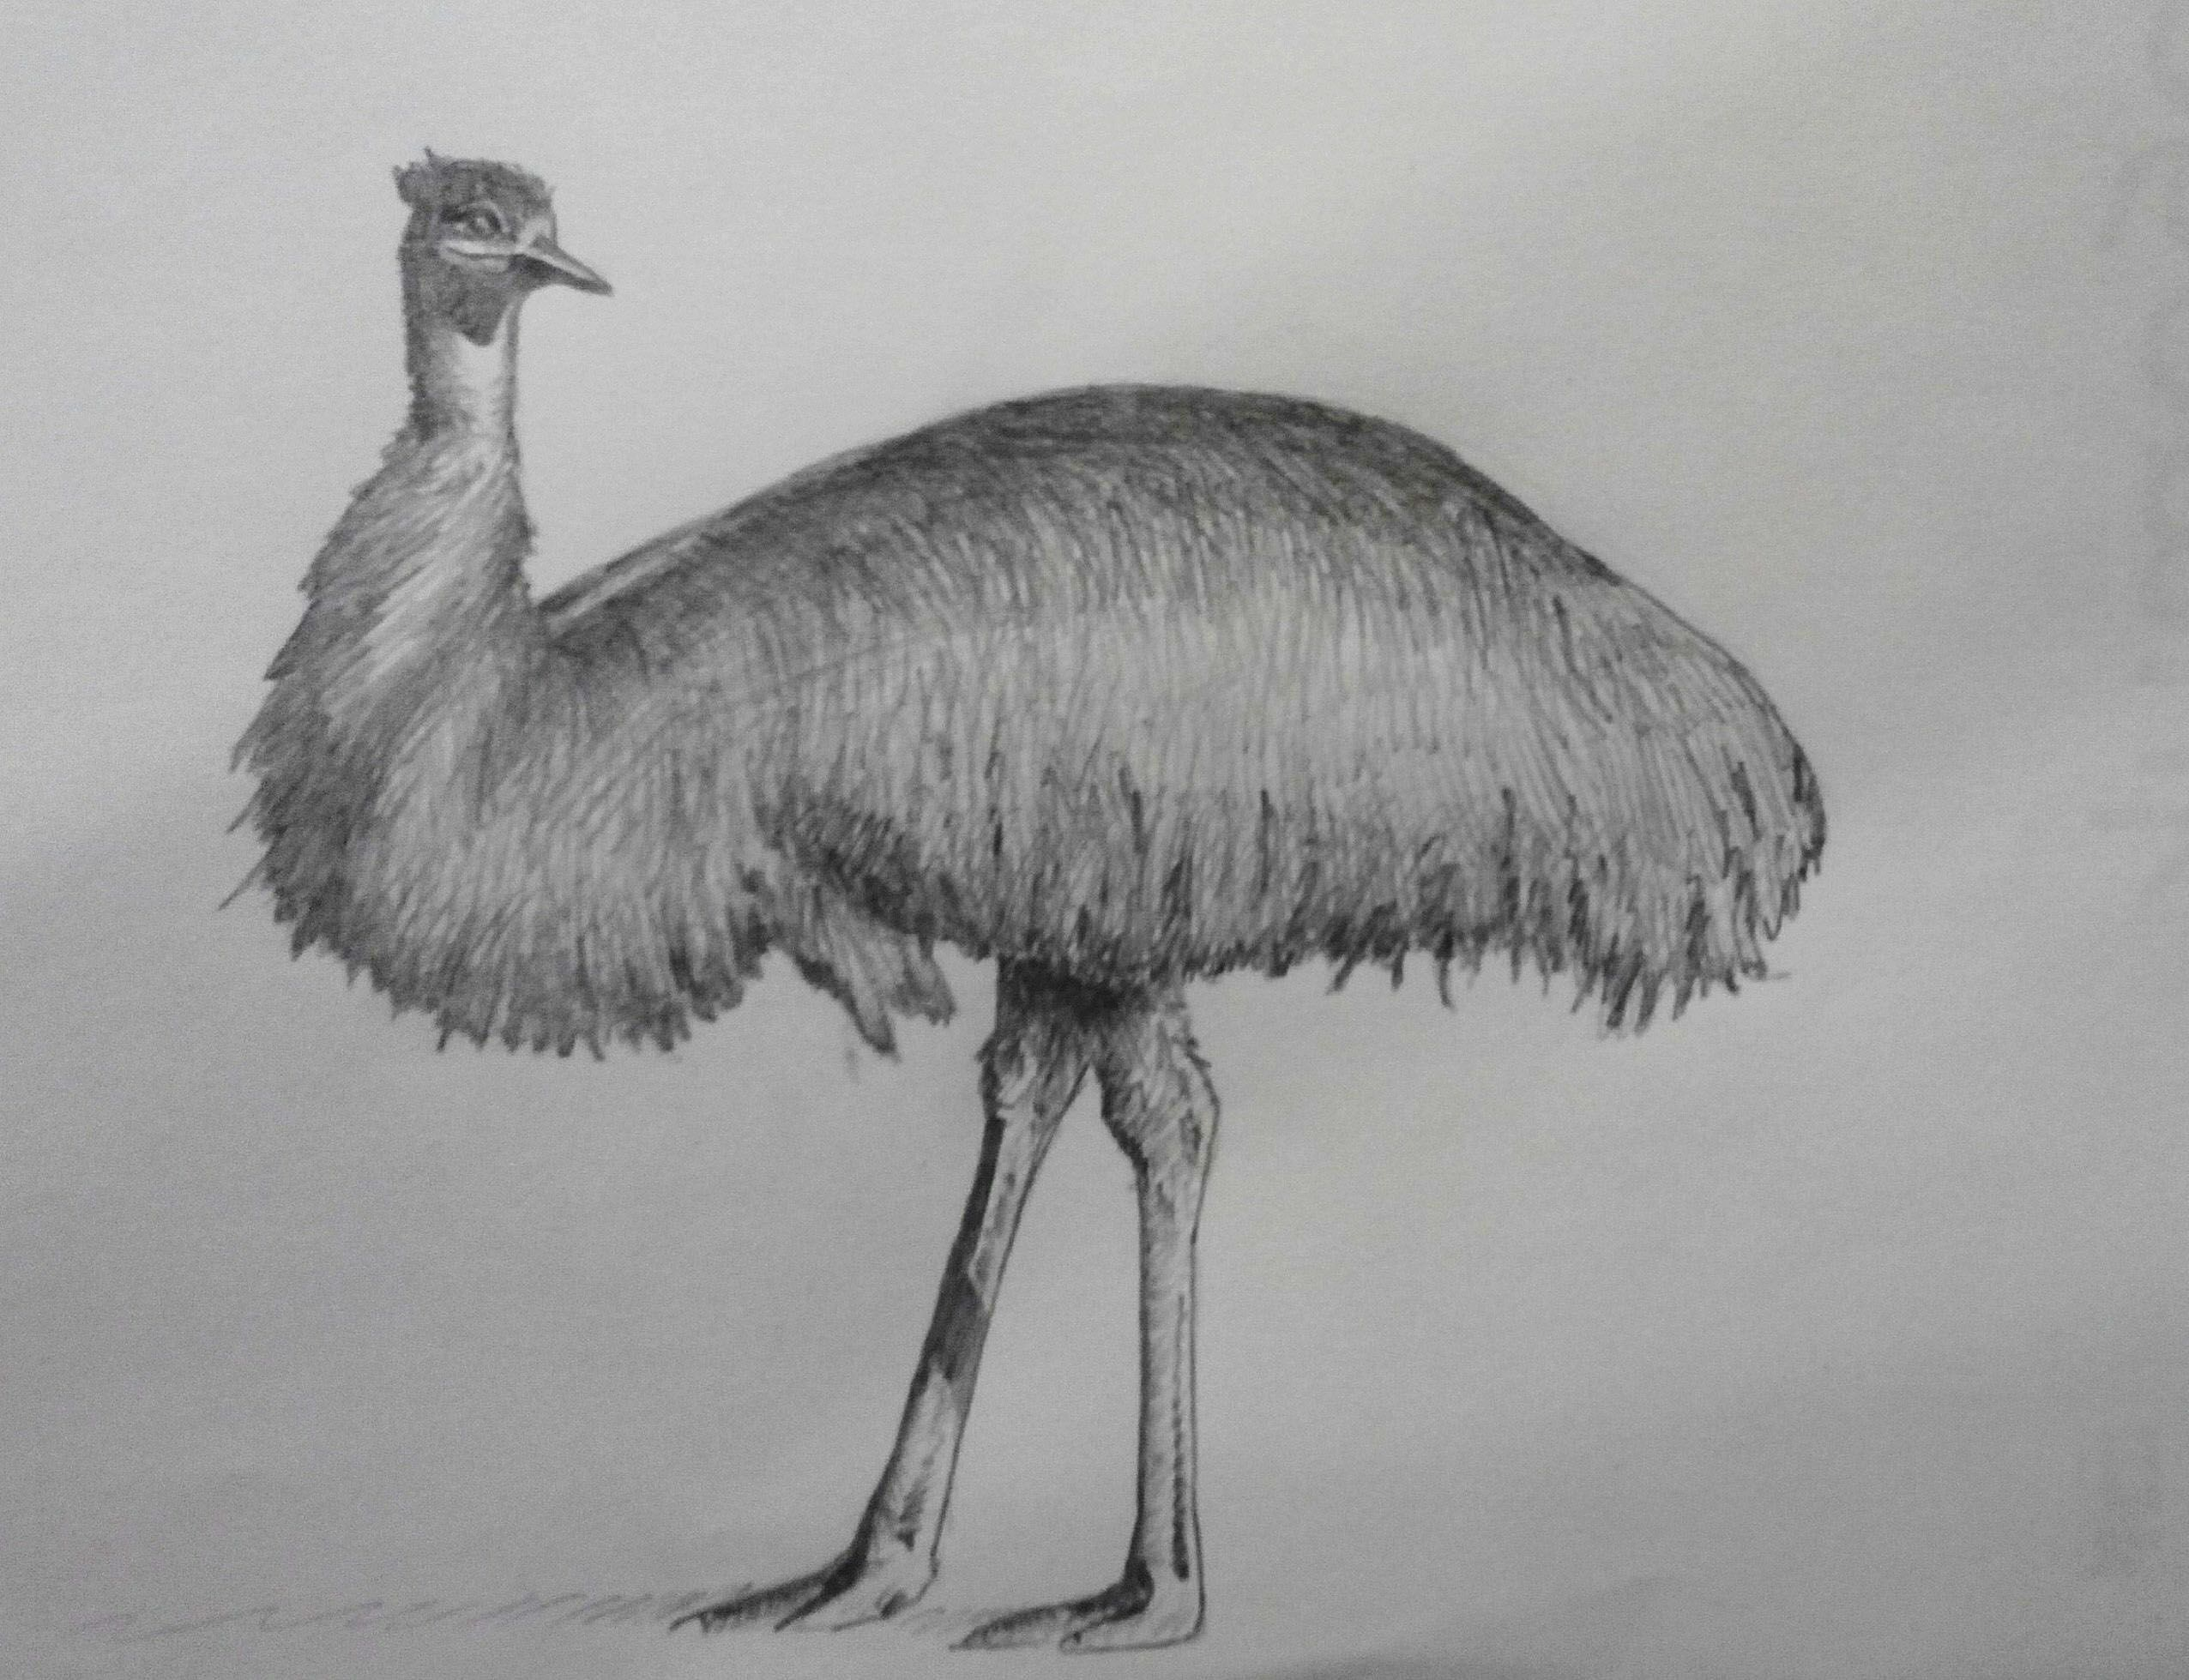 Emu Mobili ~ Скетч олівцем Ему pencil sketch emu Малюнки олівцем мої